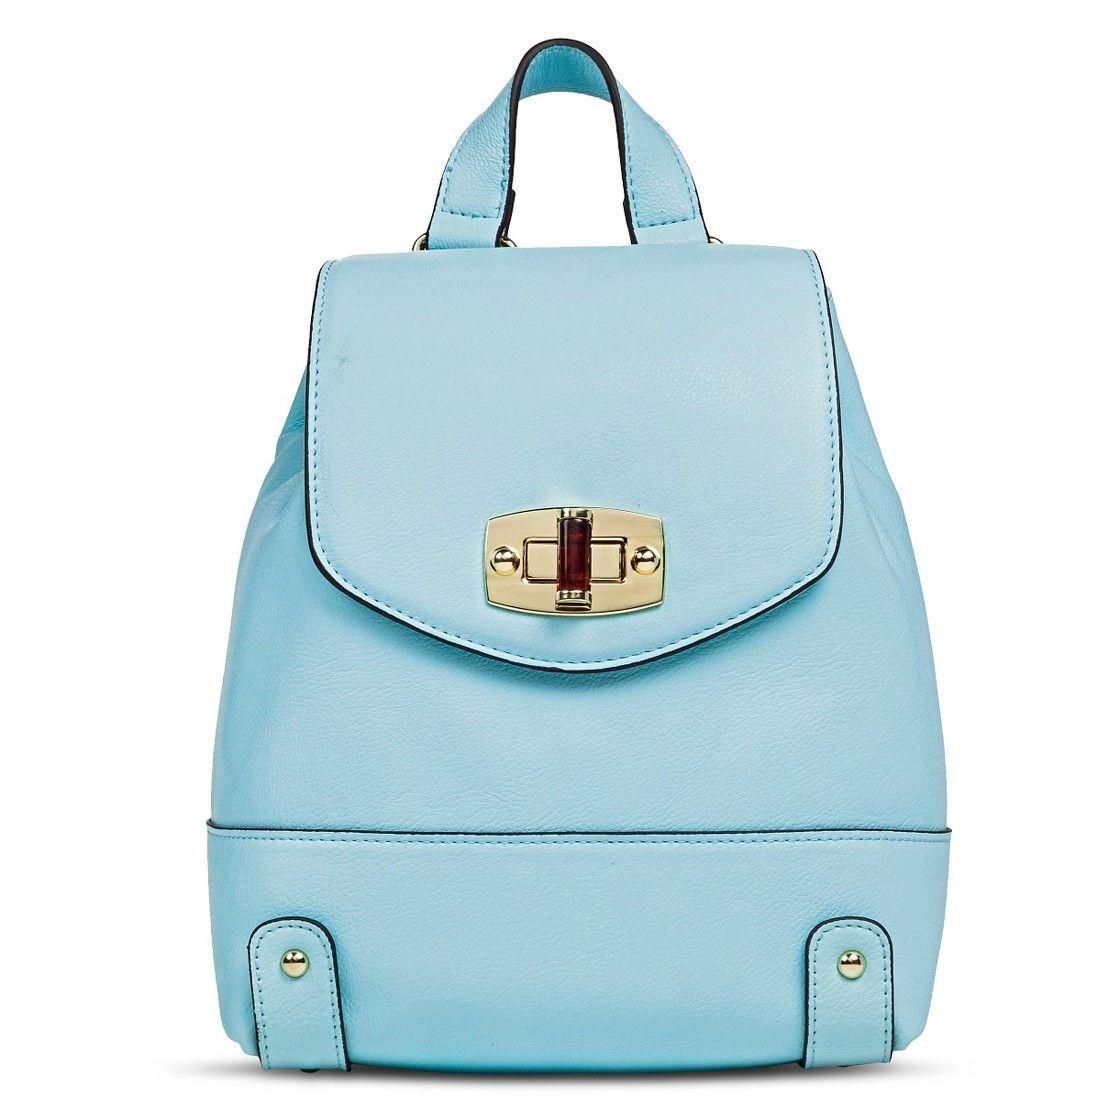 08471dd9a676 Women s Faux Leather Mini Backpack Handbag- Merona™